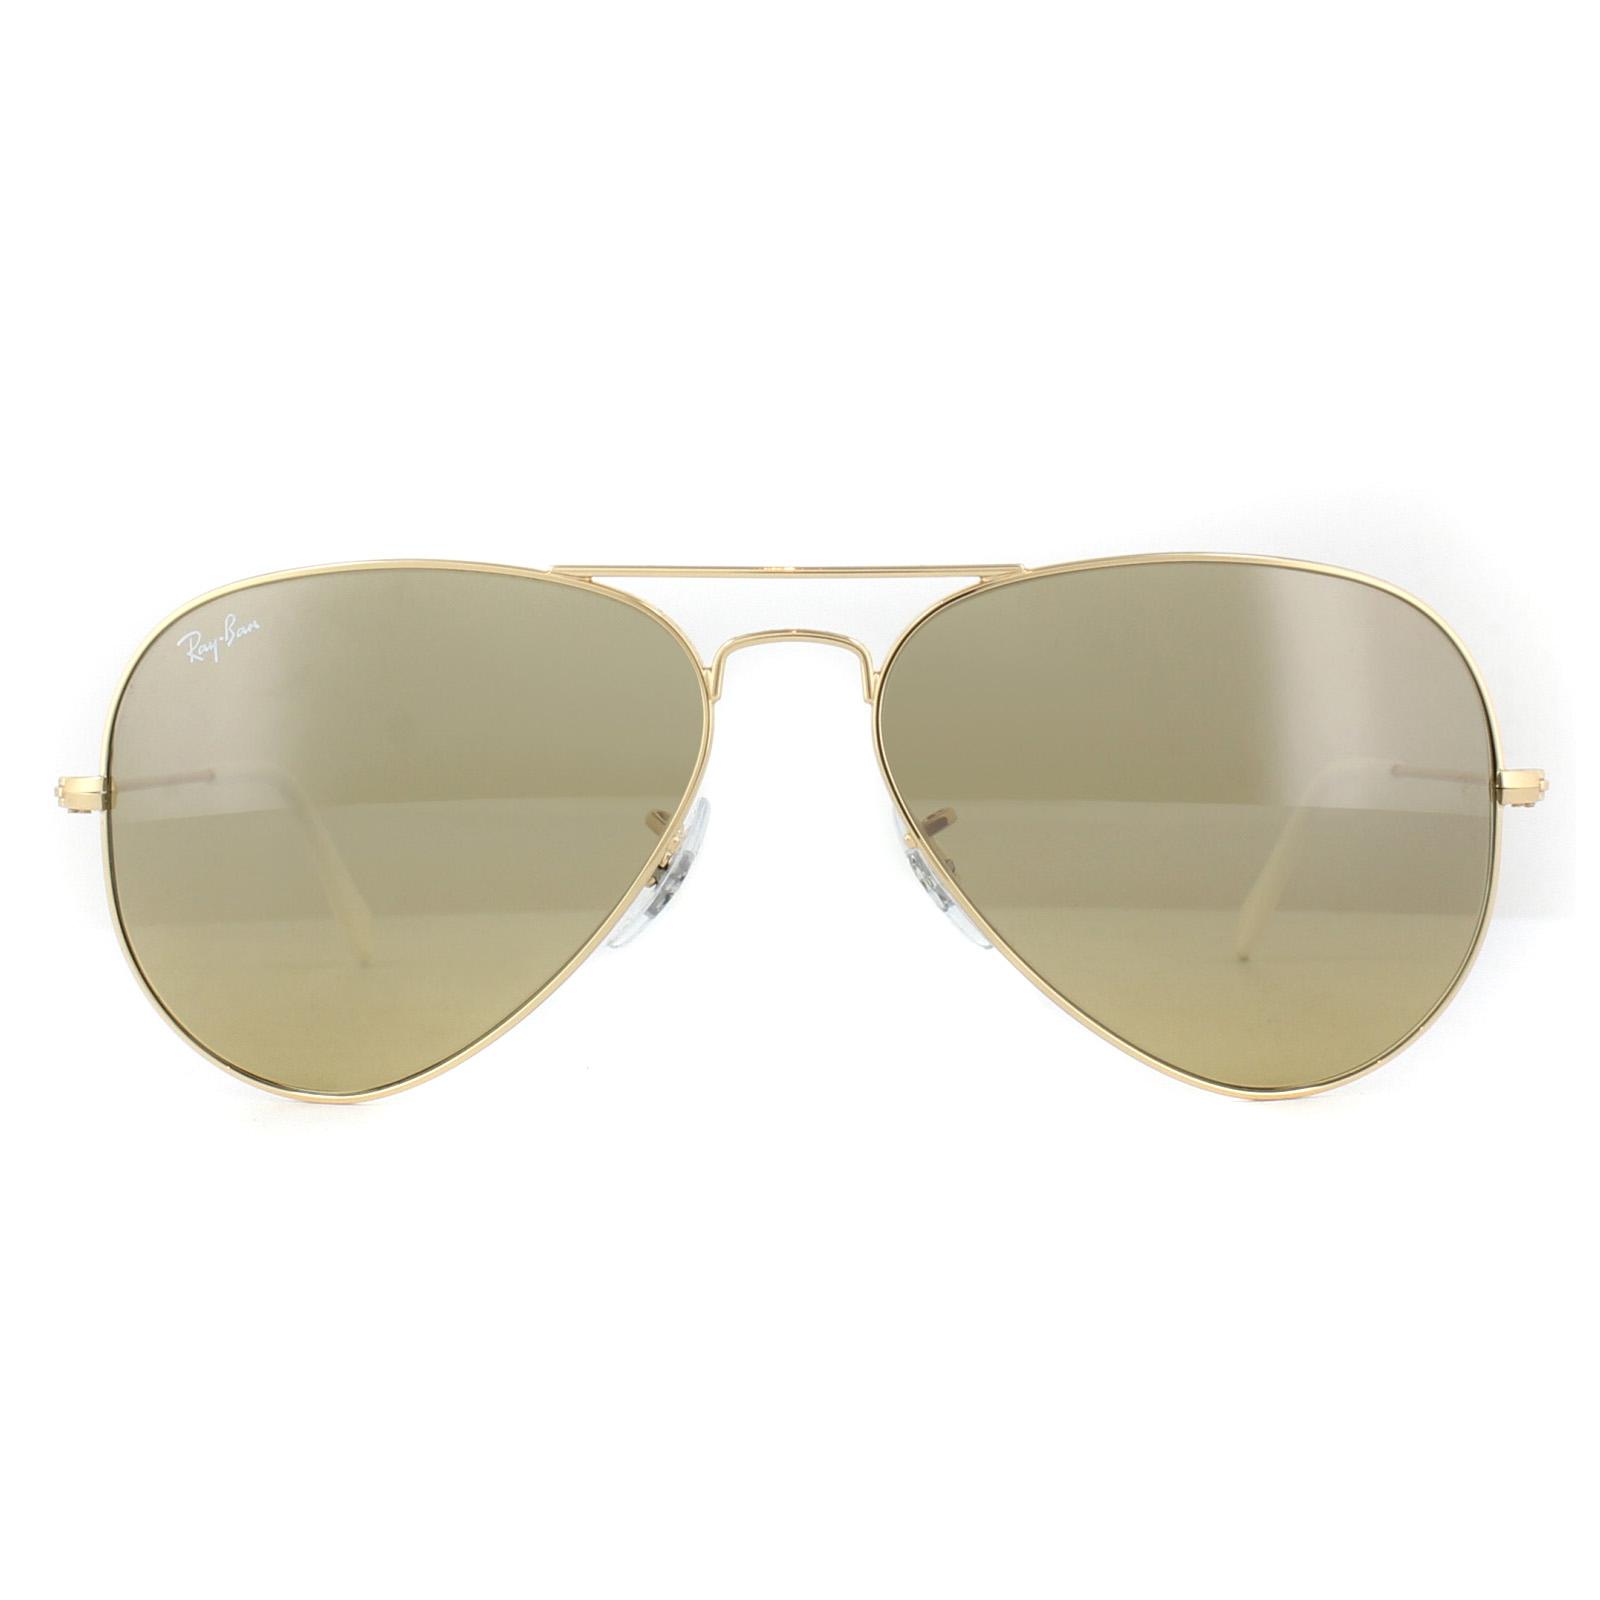 9767c325e CENTINELA Ray-Ban gafas de sol Aviator 3025 espejo marrón oro plata K 03/01